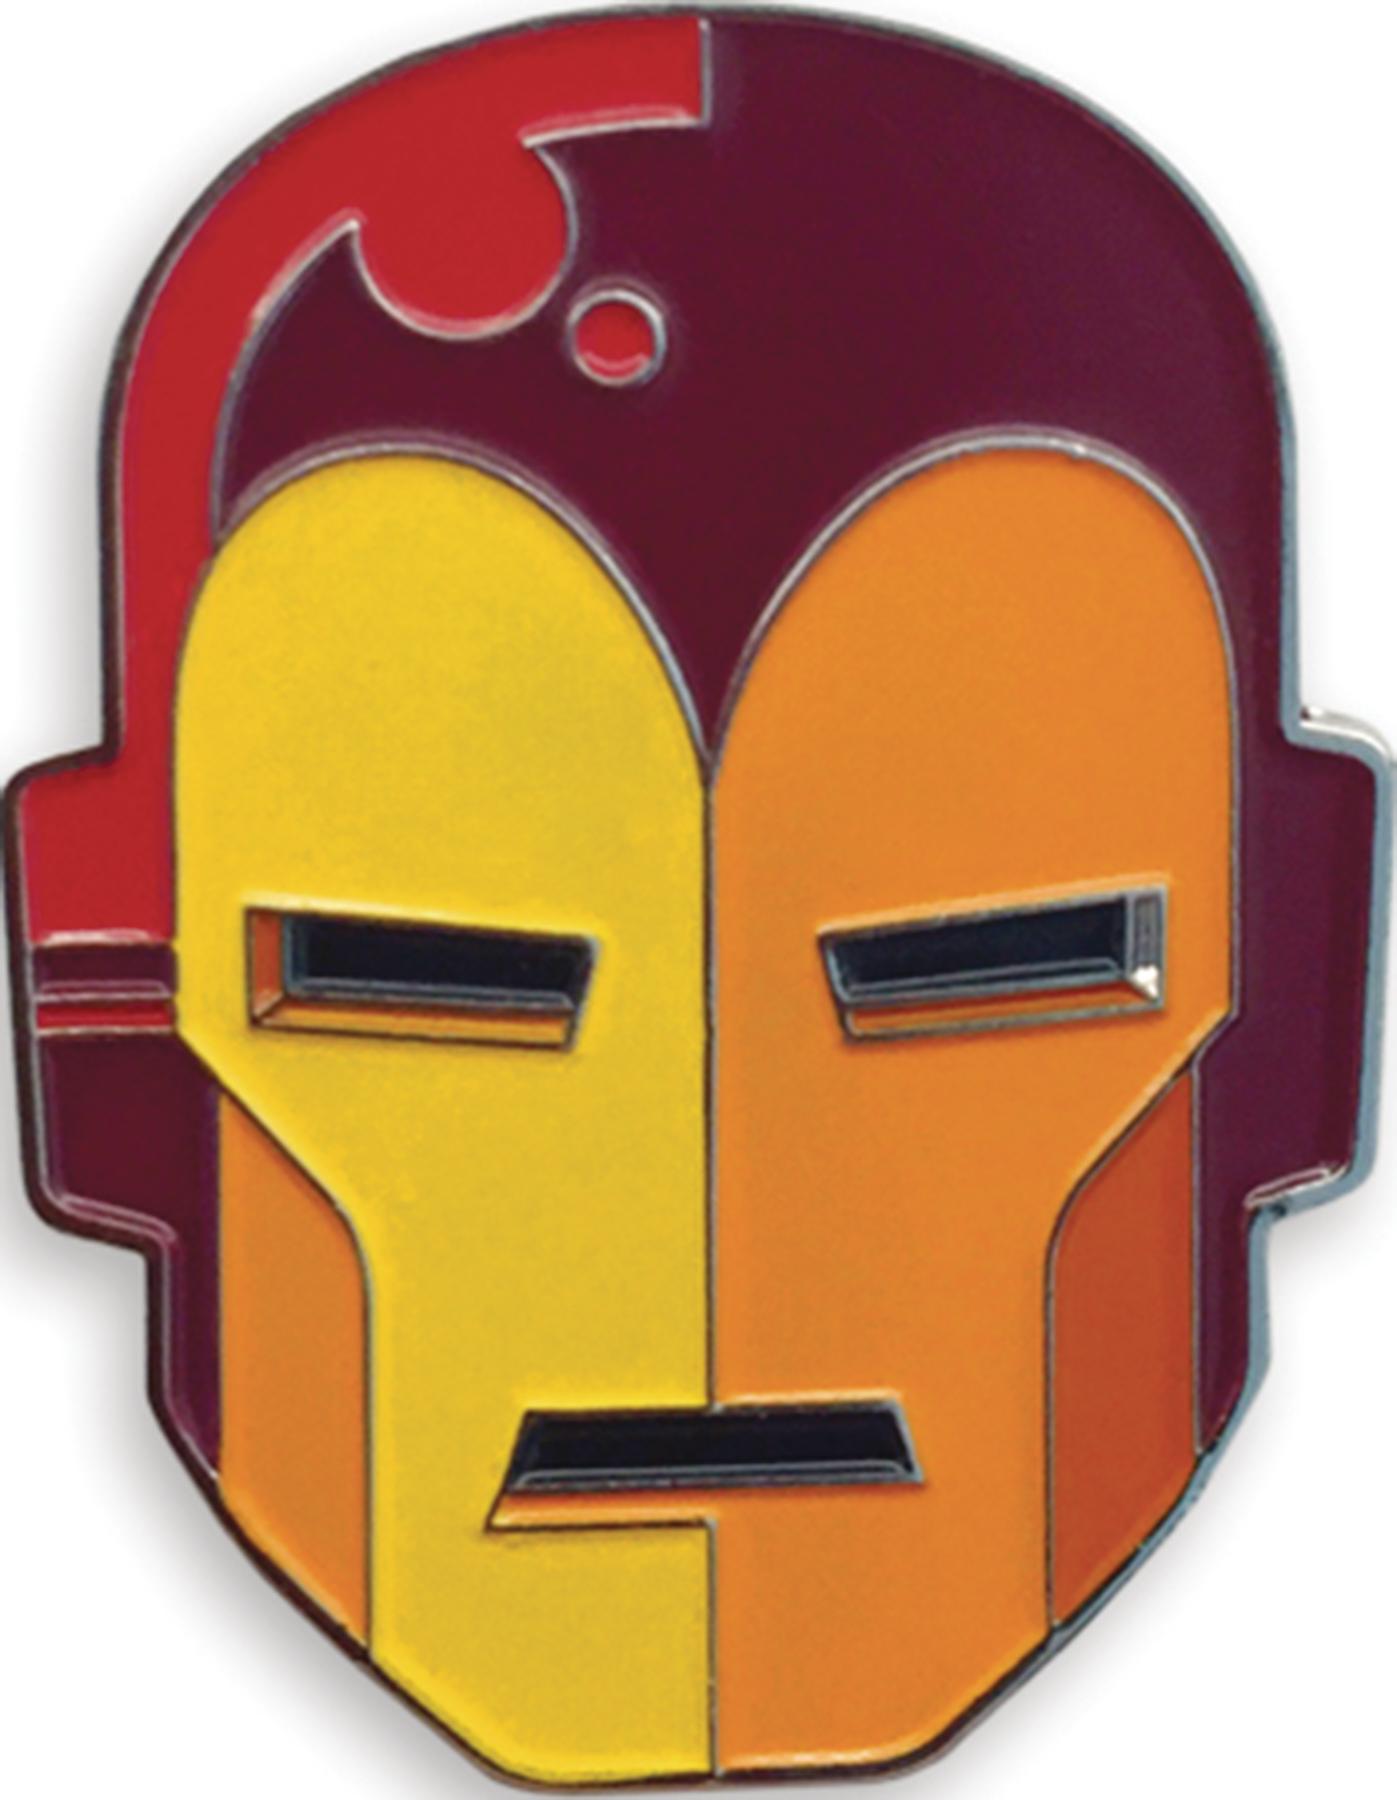 NOV168985 - MONDO X MARVEL COMICS IRON MAN ENAMEL PIN - Previews World